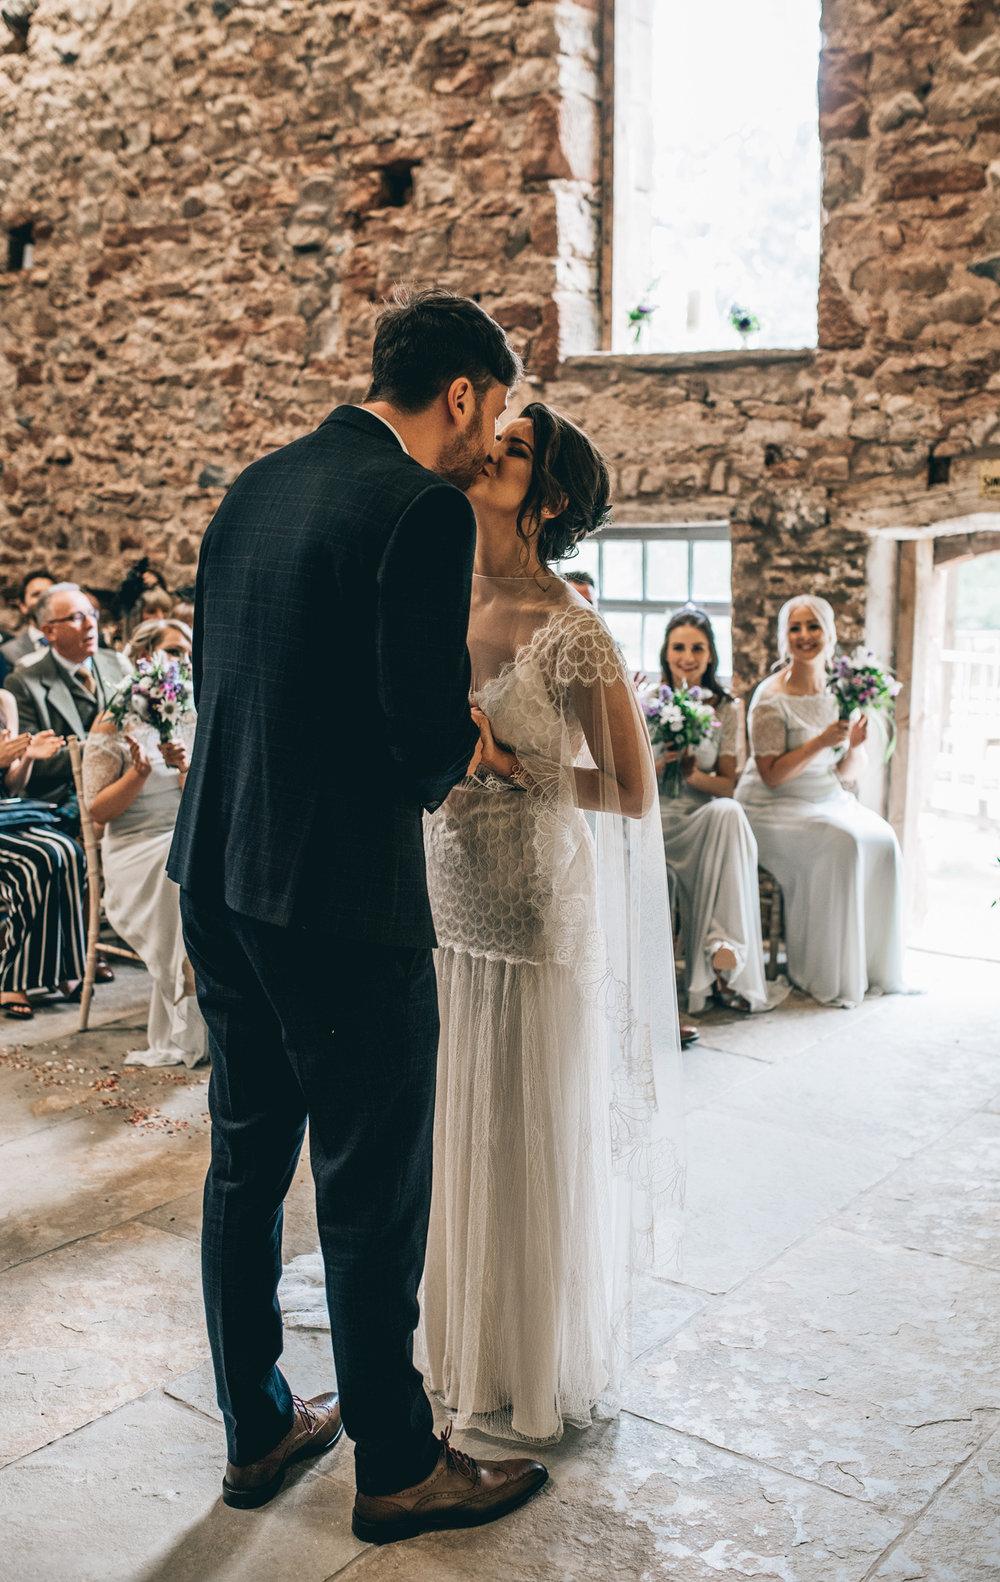 Kate-Beaumont-Sheffield-Lucy-Bohemian-Lace-Dress-Barn-Wedding-Cumbria-13.jpg